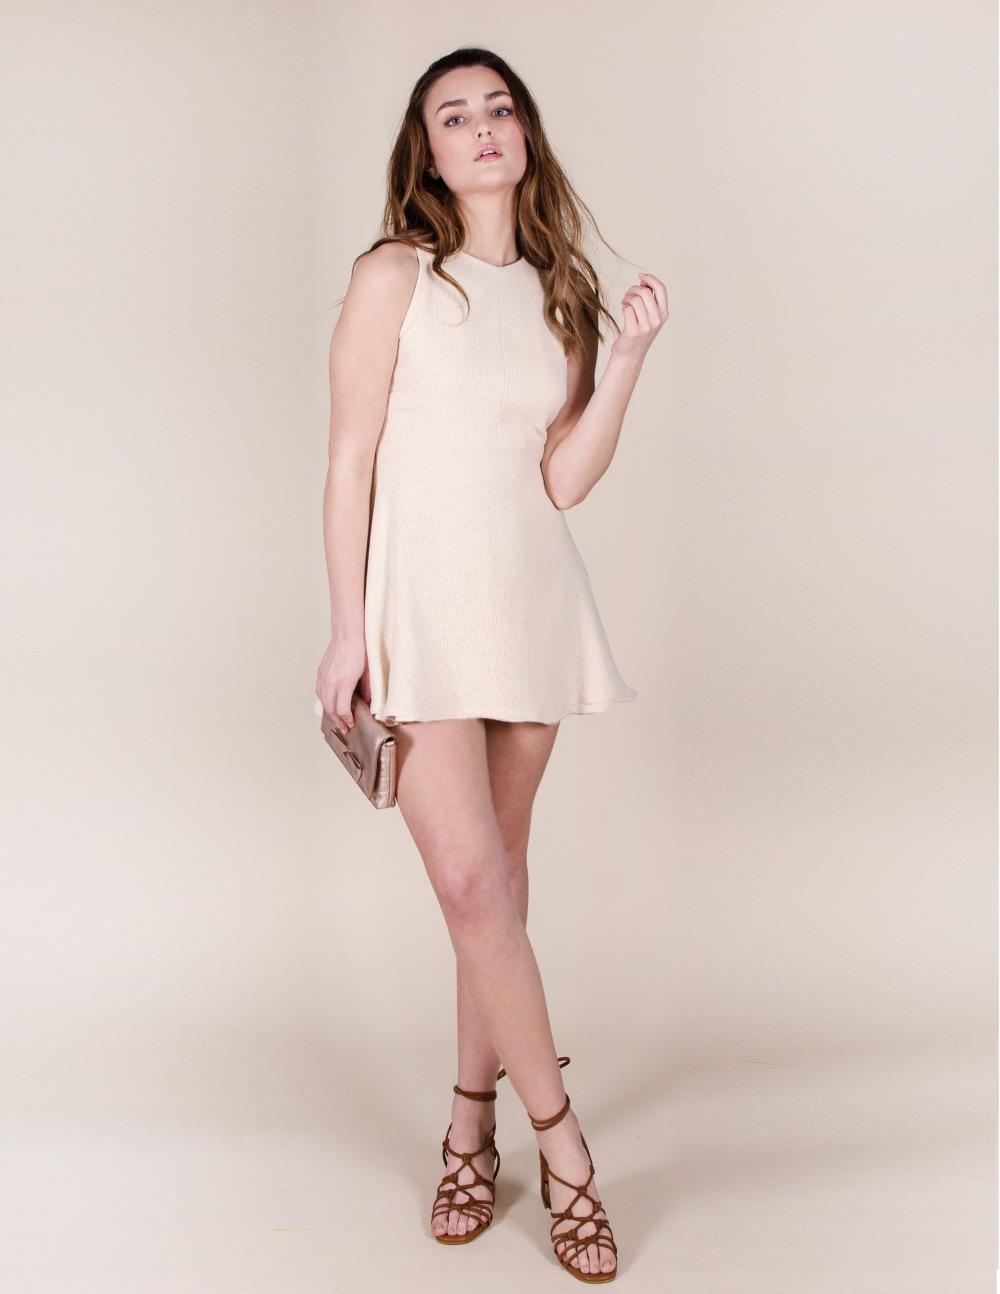 Alyssa Nicole The Khailey Dress 1